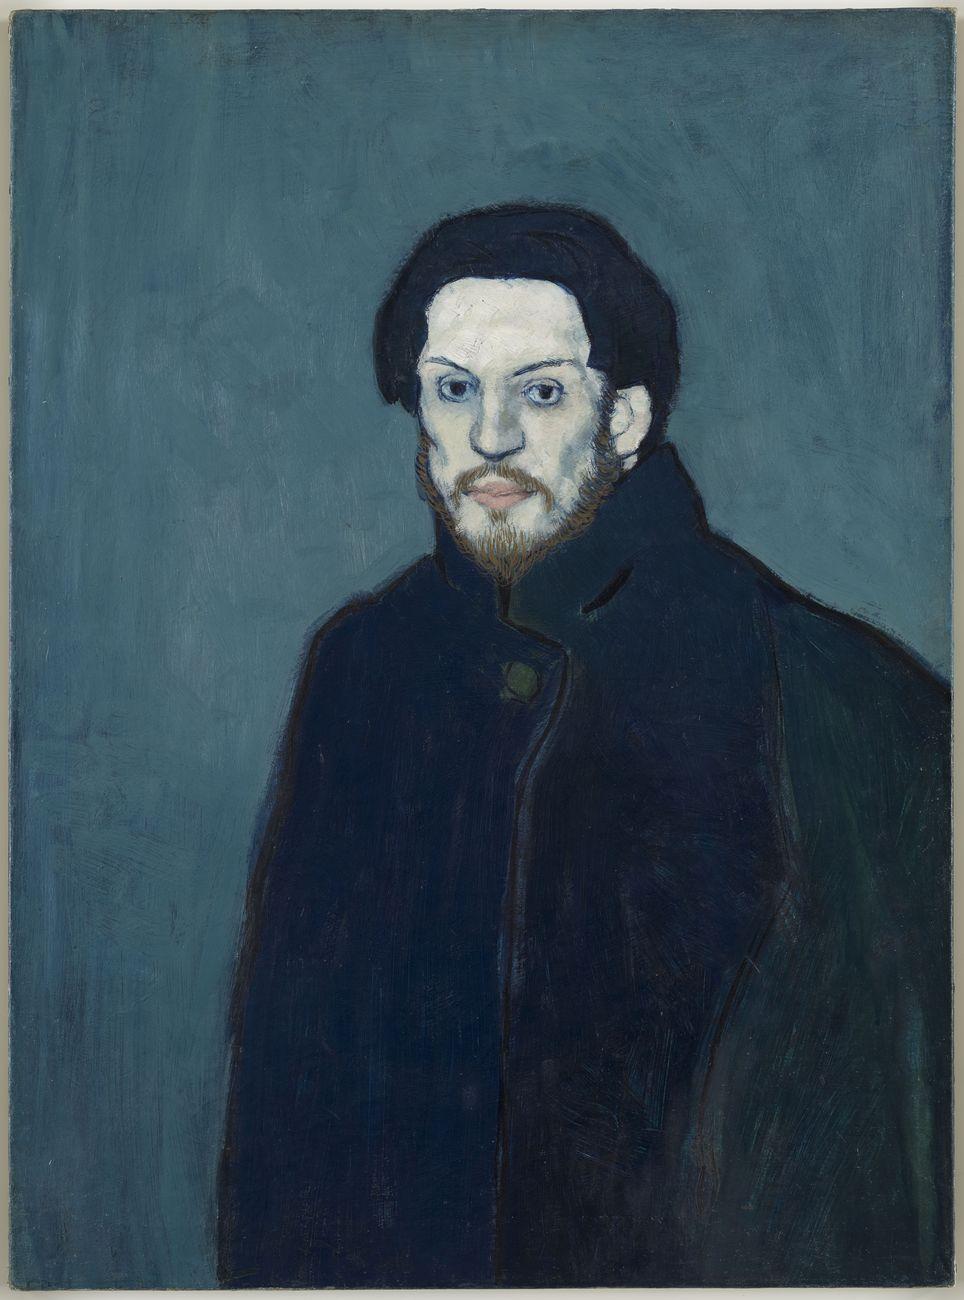 Pablo Picasso, Autoportrait, Paris, inverno 1901, olio su tela, 81 x 60 cm. Musée national Picasso, Parigi. Photo © RMN-Grand Palais – Mathieu Rabeau © Succession Picasso 2021